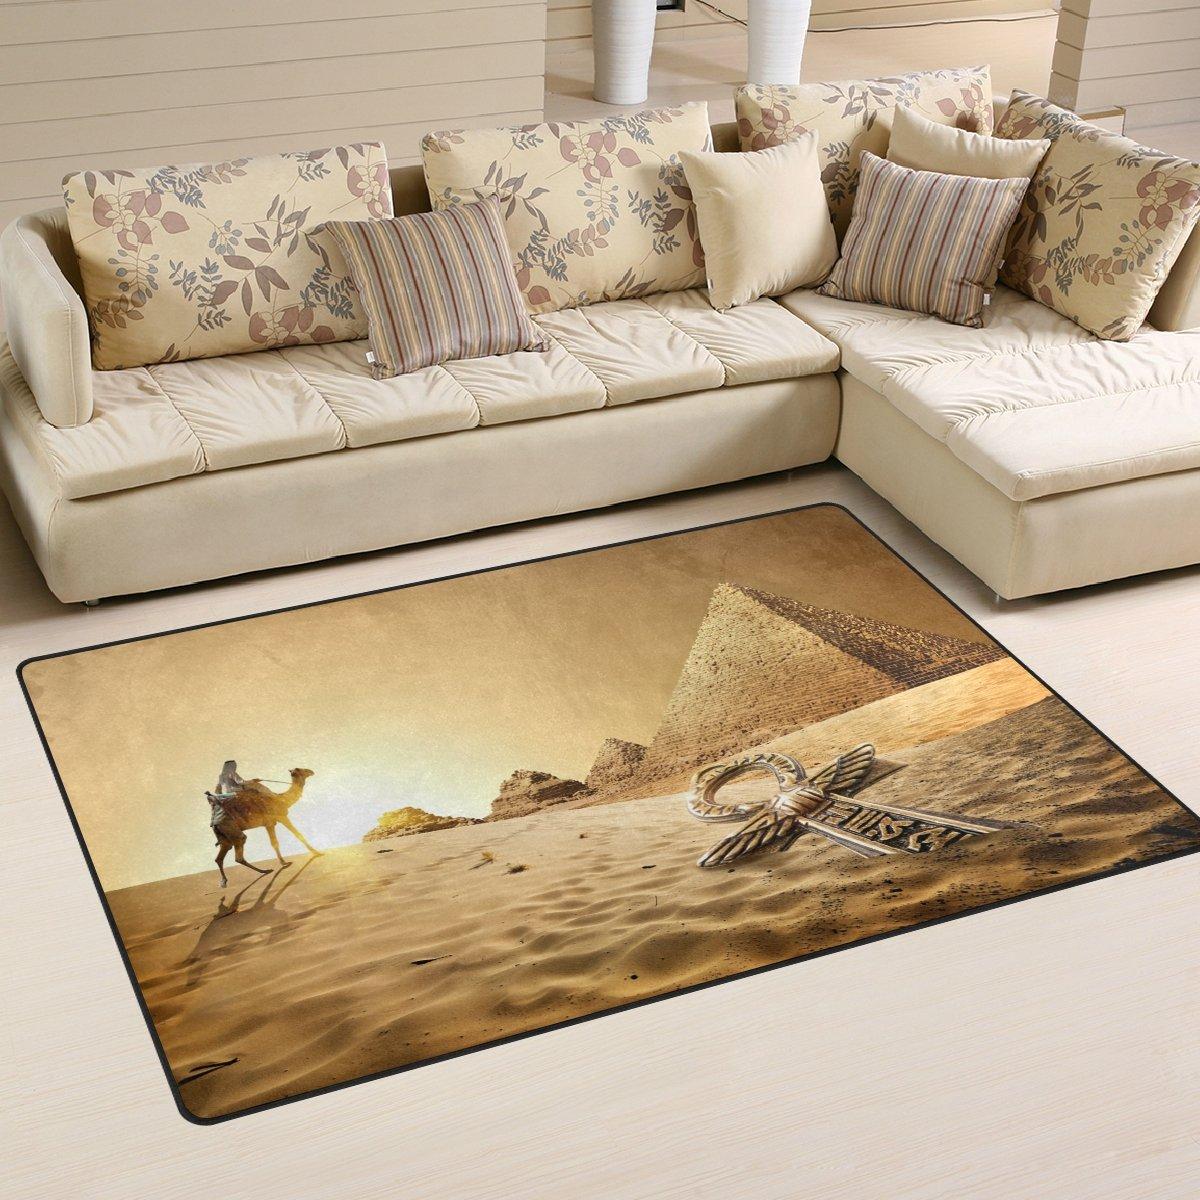 WellLee Egyptian Area Rug 5'x3',Camel Near Pyramids Ankh Floor Rug Non-Slip Doormat for Living Dining Dorm Room Bedroom Decor WelllLee dtfh-001